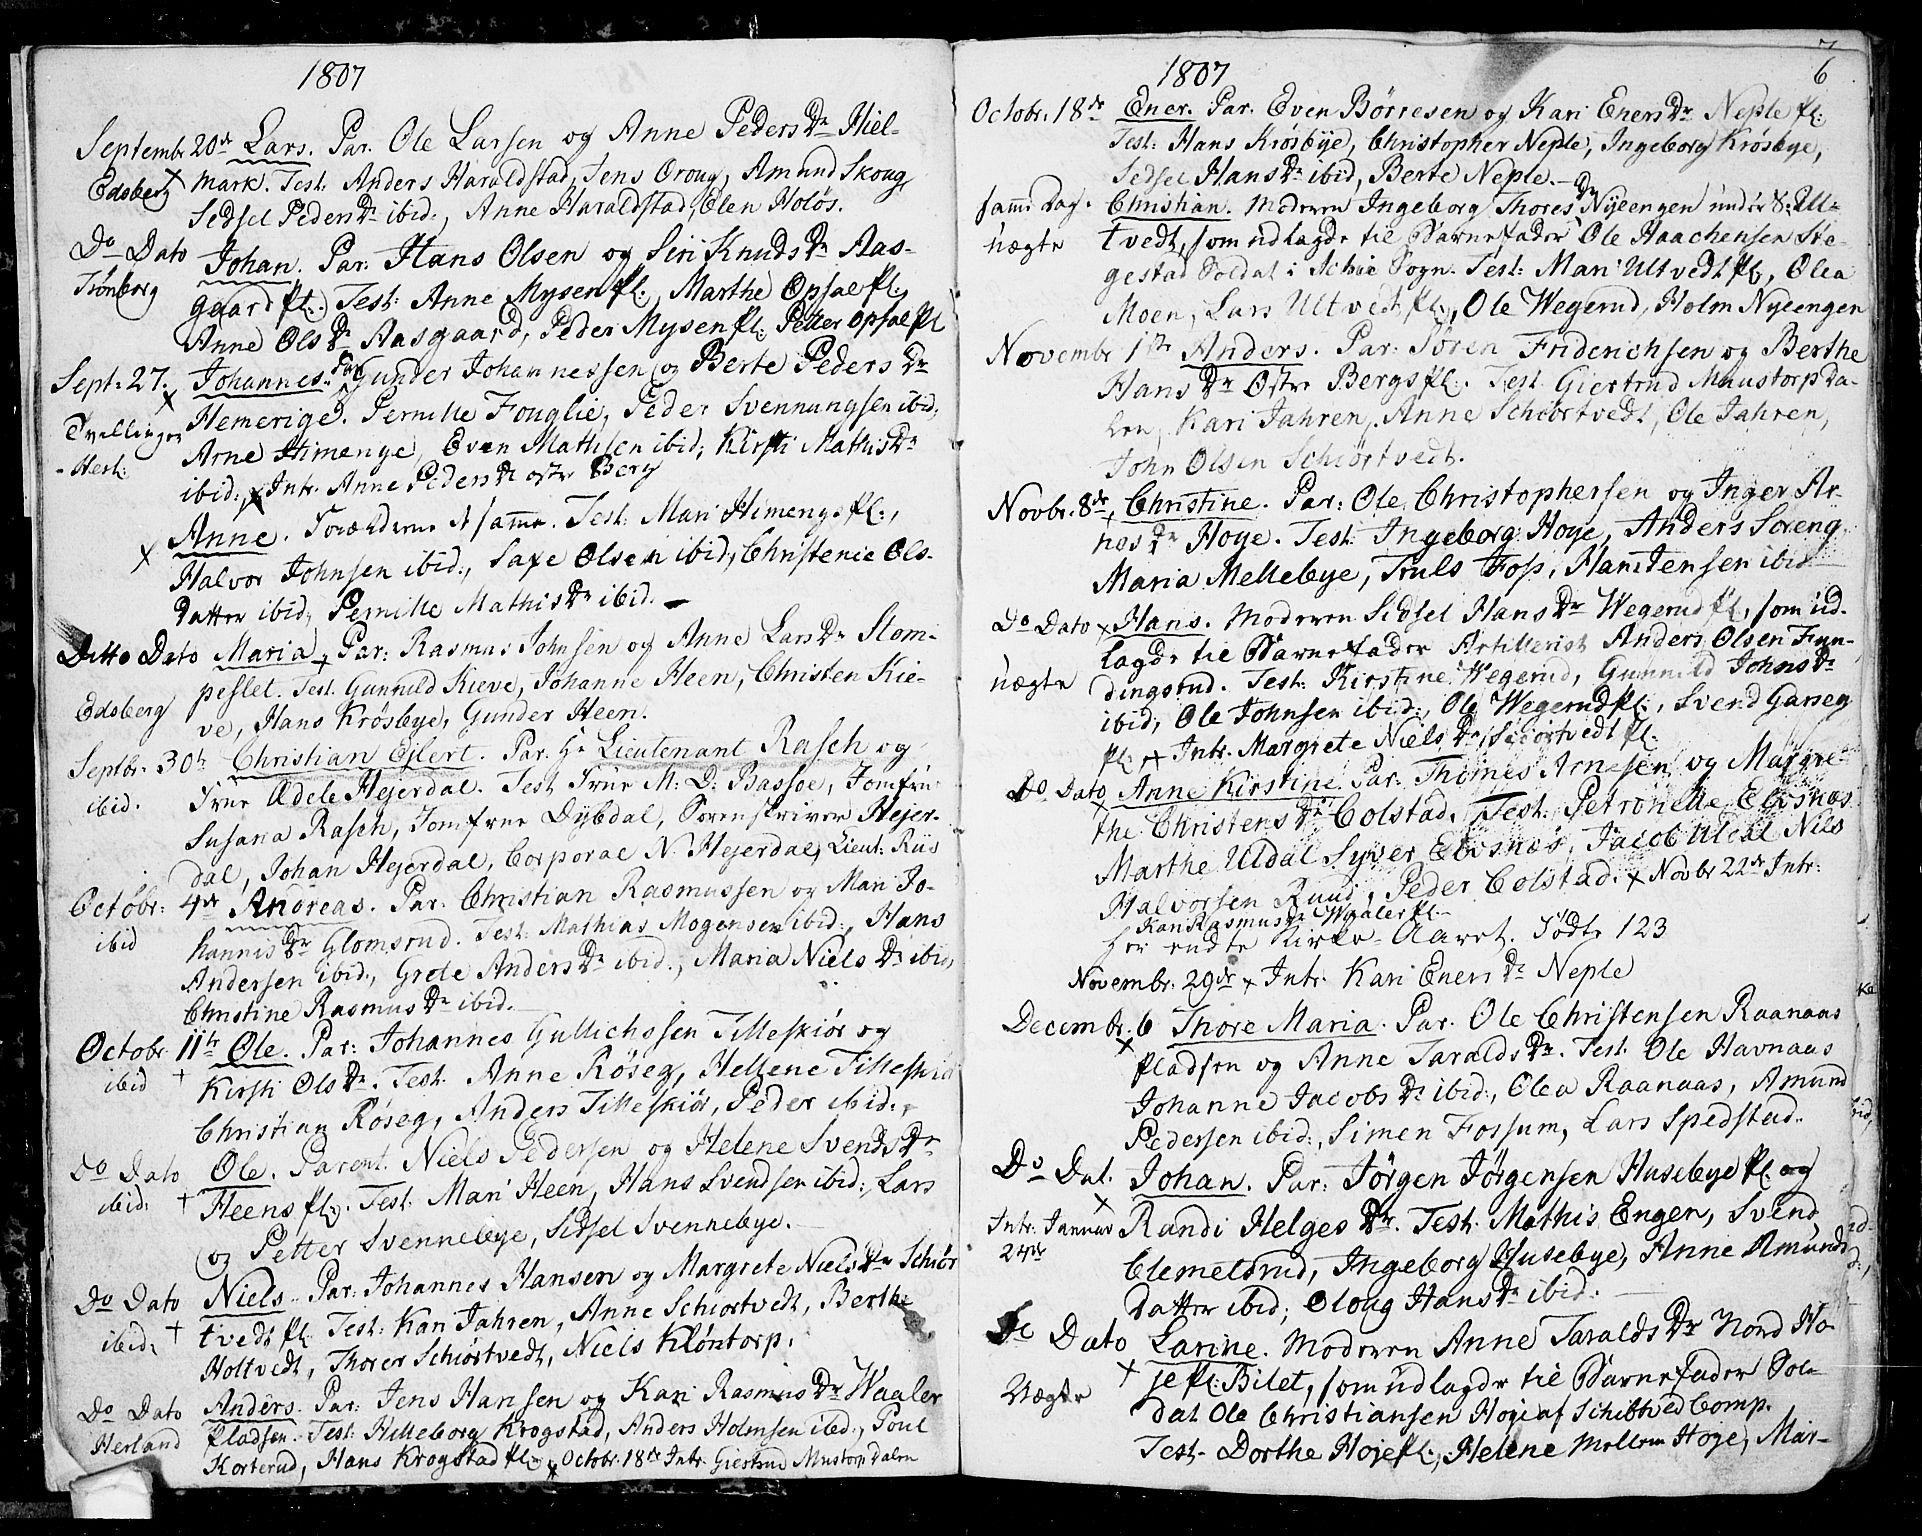 SAO, Eidsberg prestekontor Kirkebøker, F/Fa/L0006: Ministerialbok nr. I 6, 1807-1814, s. 6